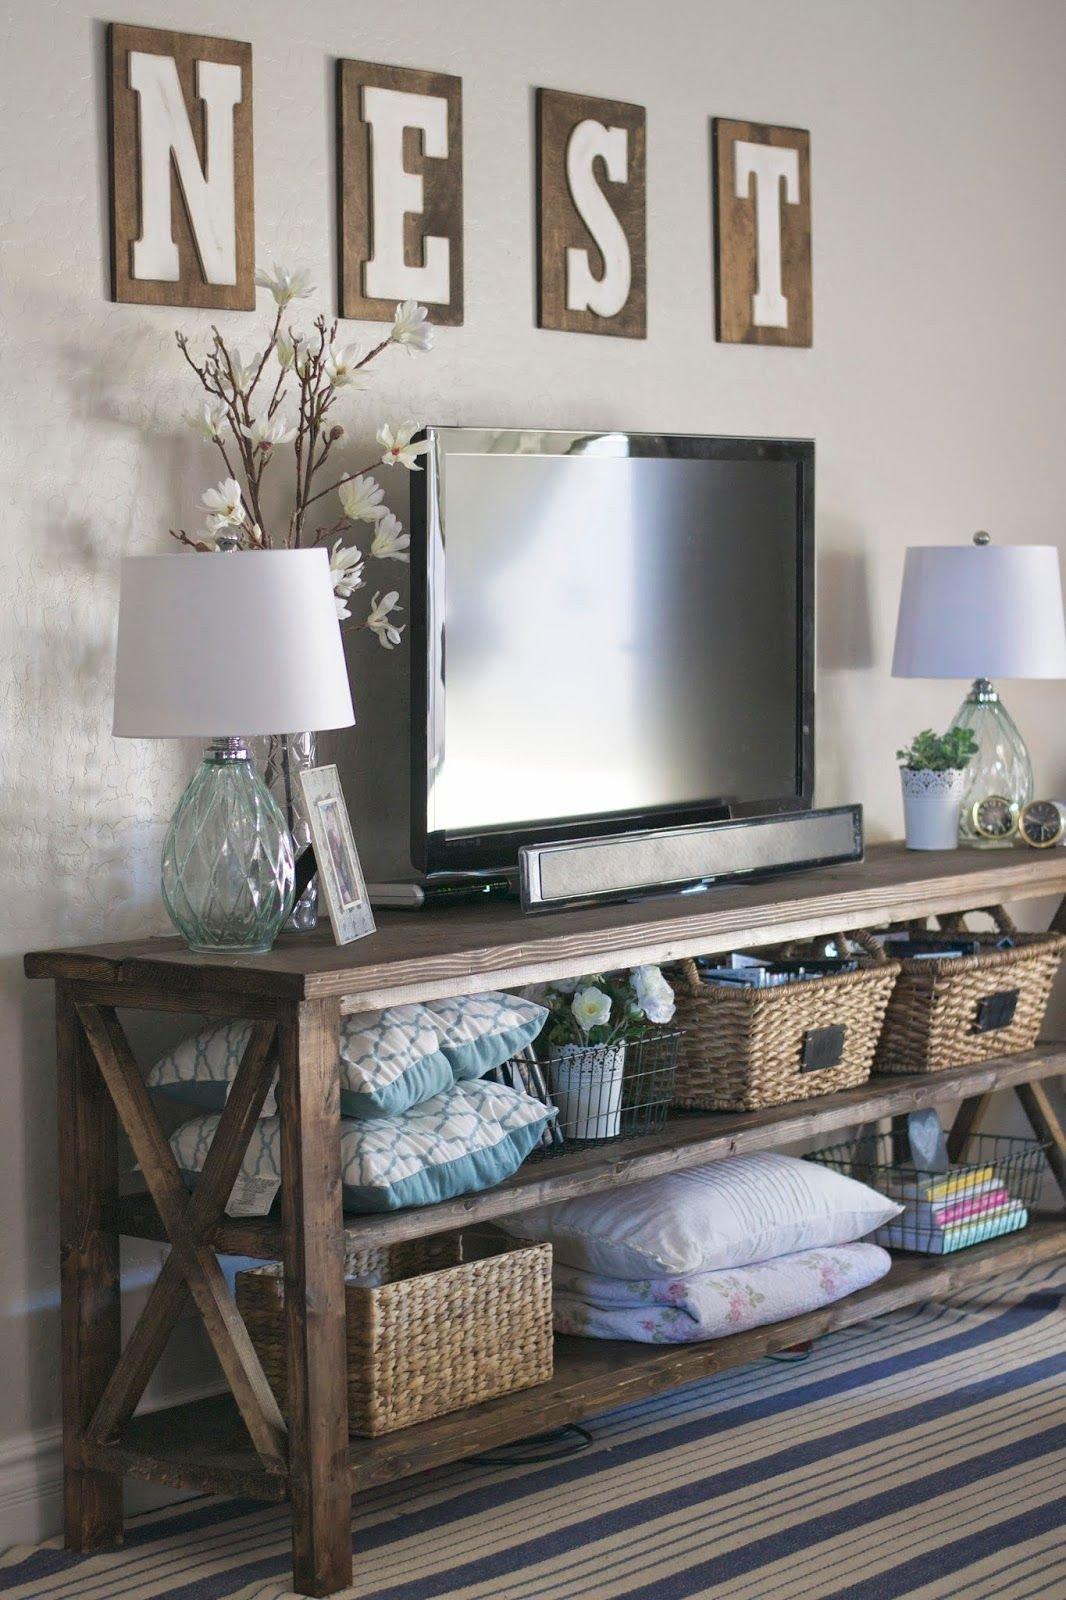 Farmhouse Tv Stand Design Ideas and Decor Farmhouse Home Decor Ideas Crafts & Diy